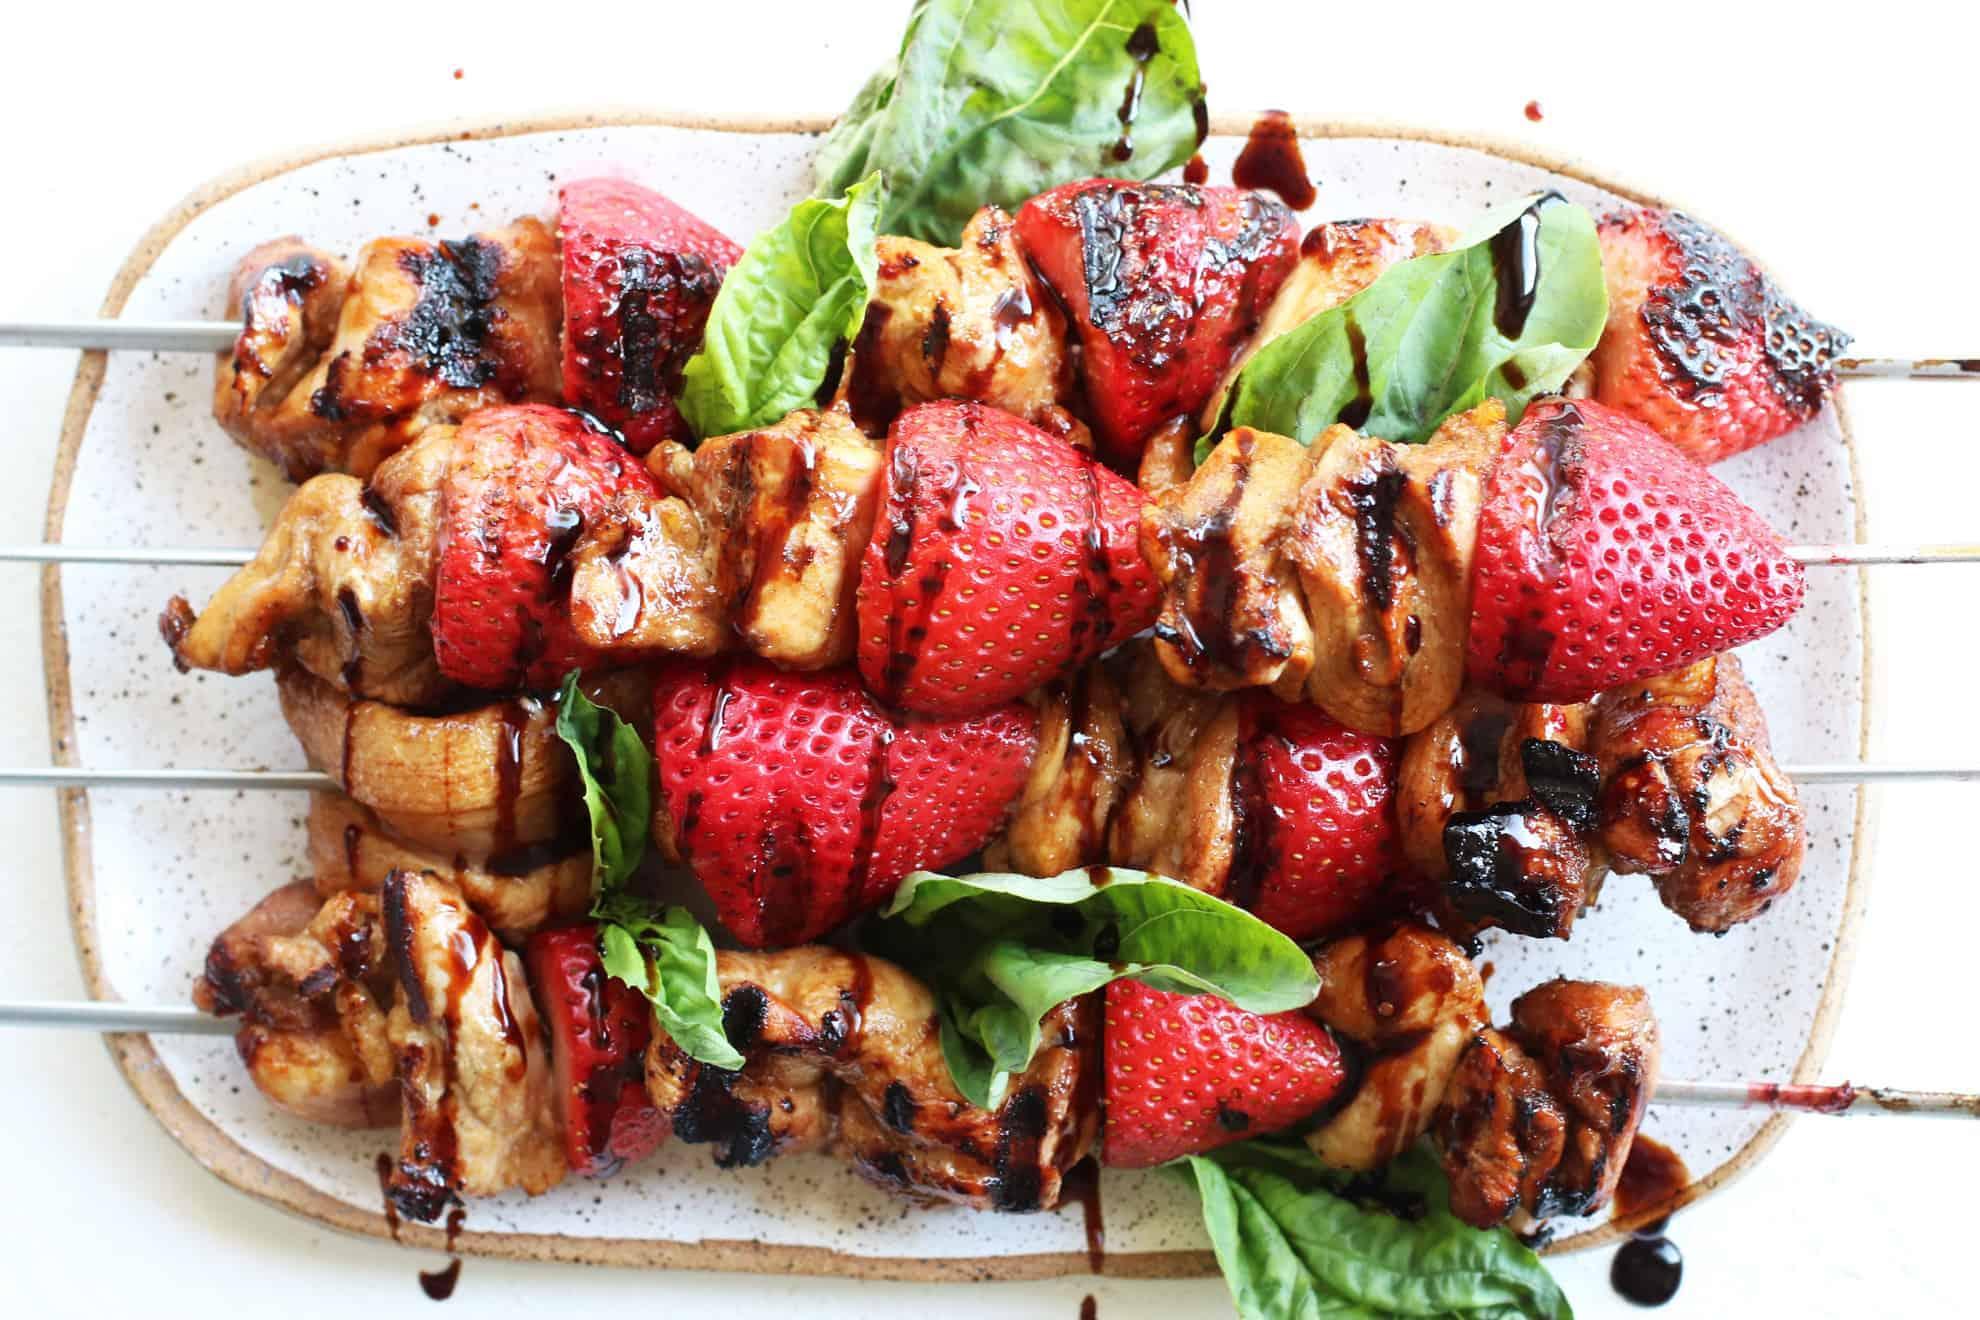 Grilled Strawberry Balsamic Chicken Kabobs